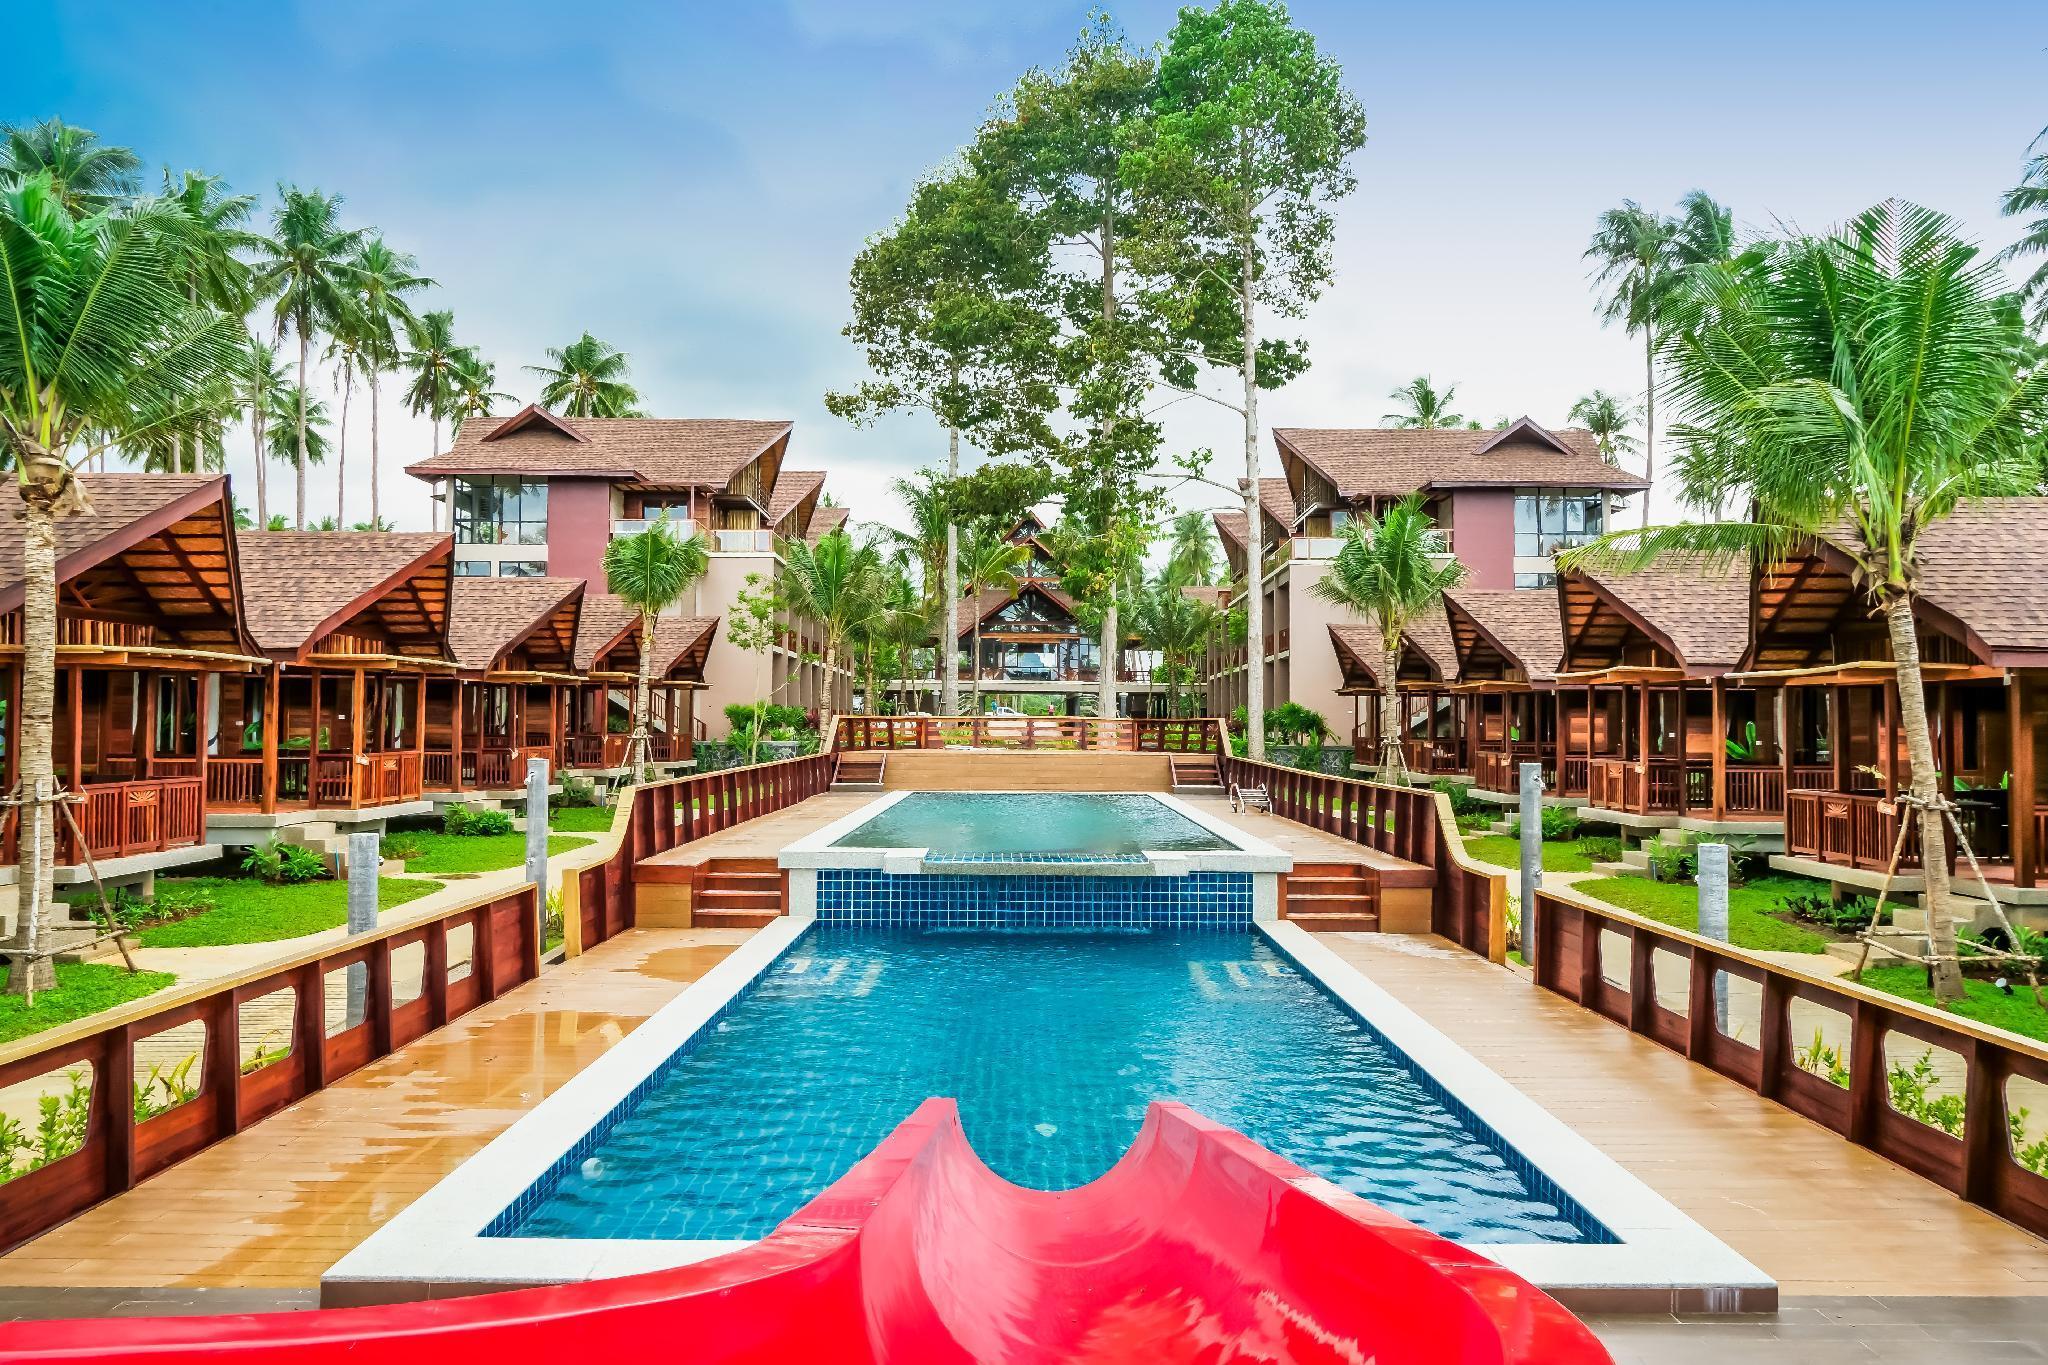 khanom cabana beach resort in khanom nakhon si thammarat room rh agoda com